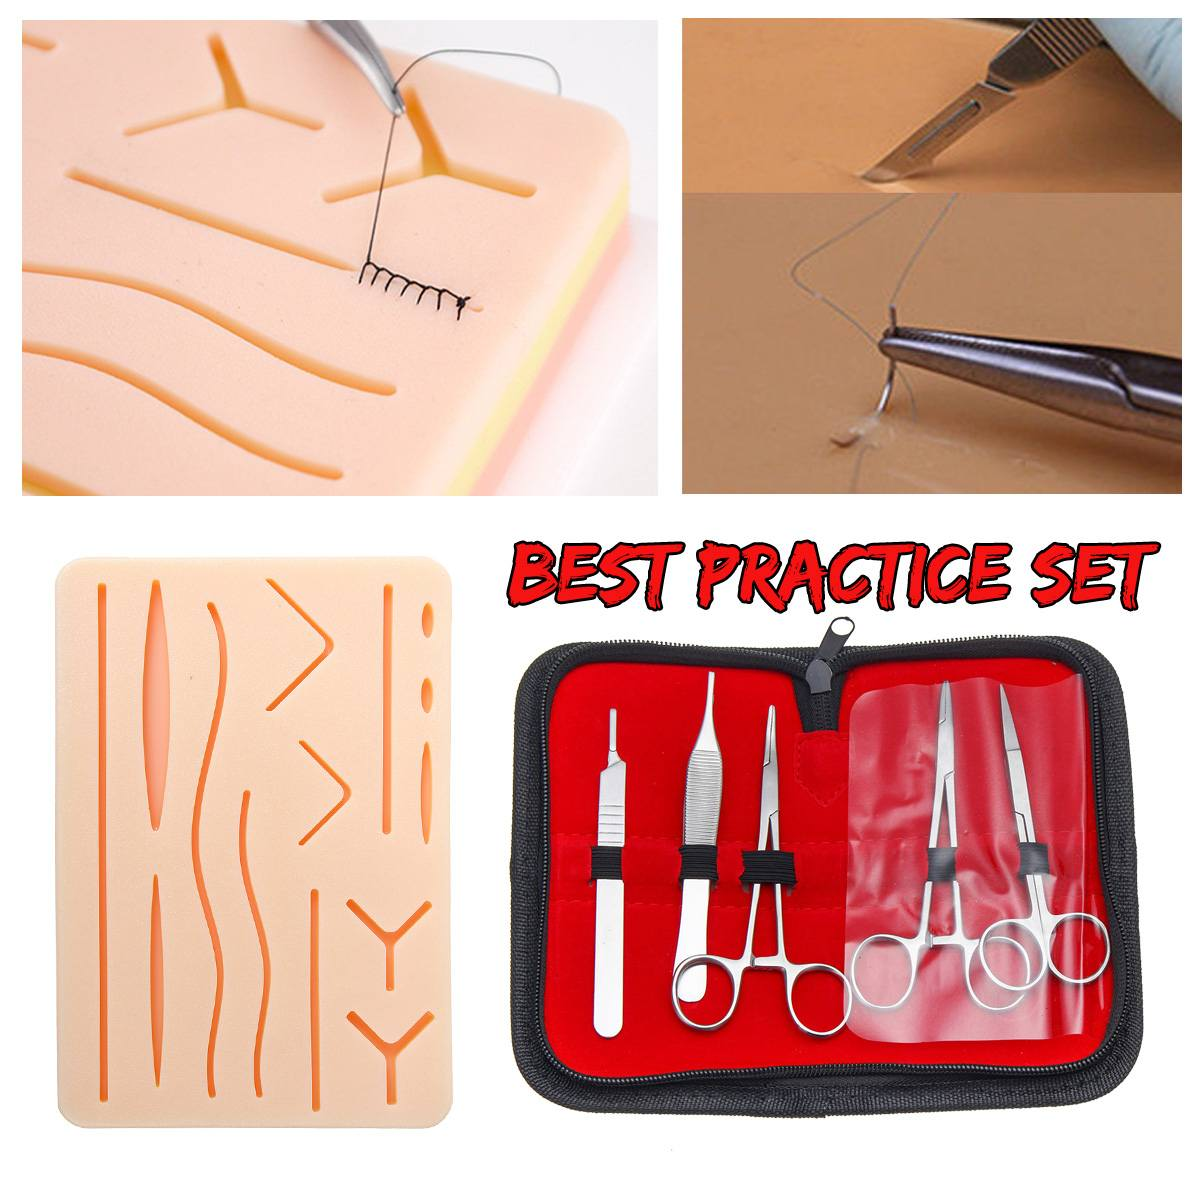 Surgical Suture Scissors-Tool-Kit Needle Training-Kit Practice-Model Skin-Operate Medical-Teaching